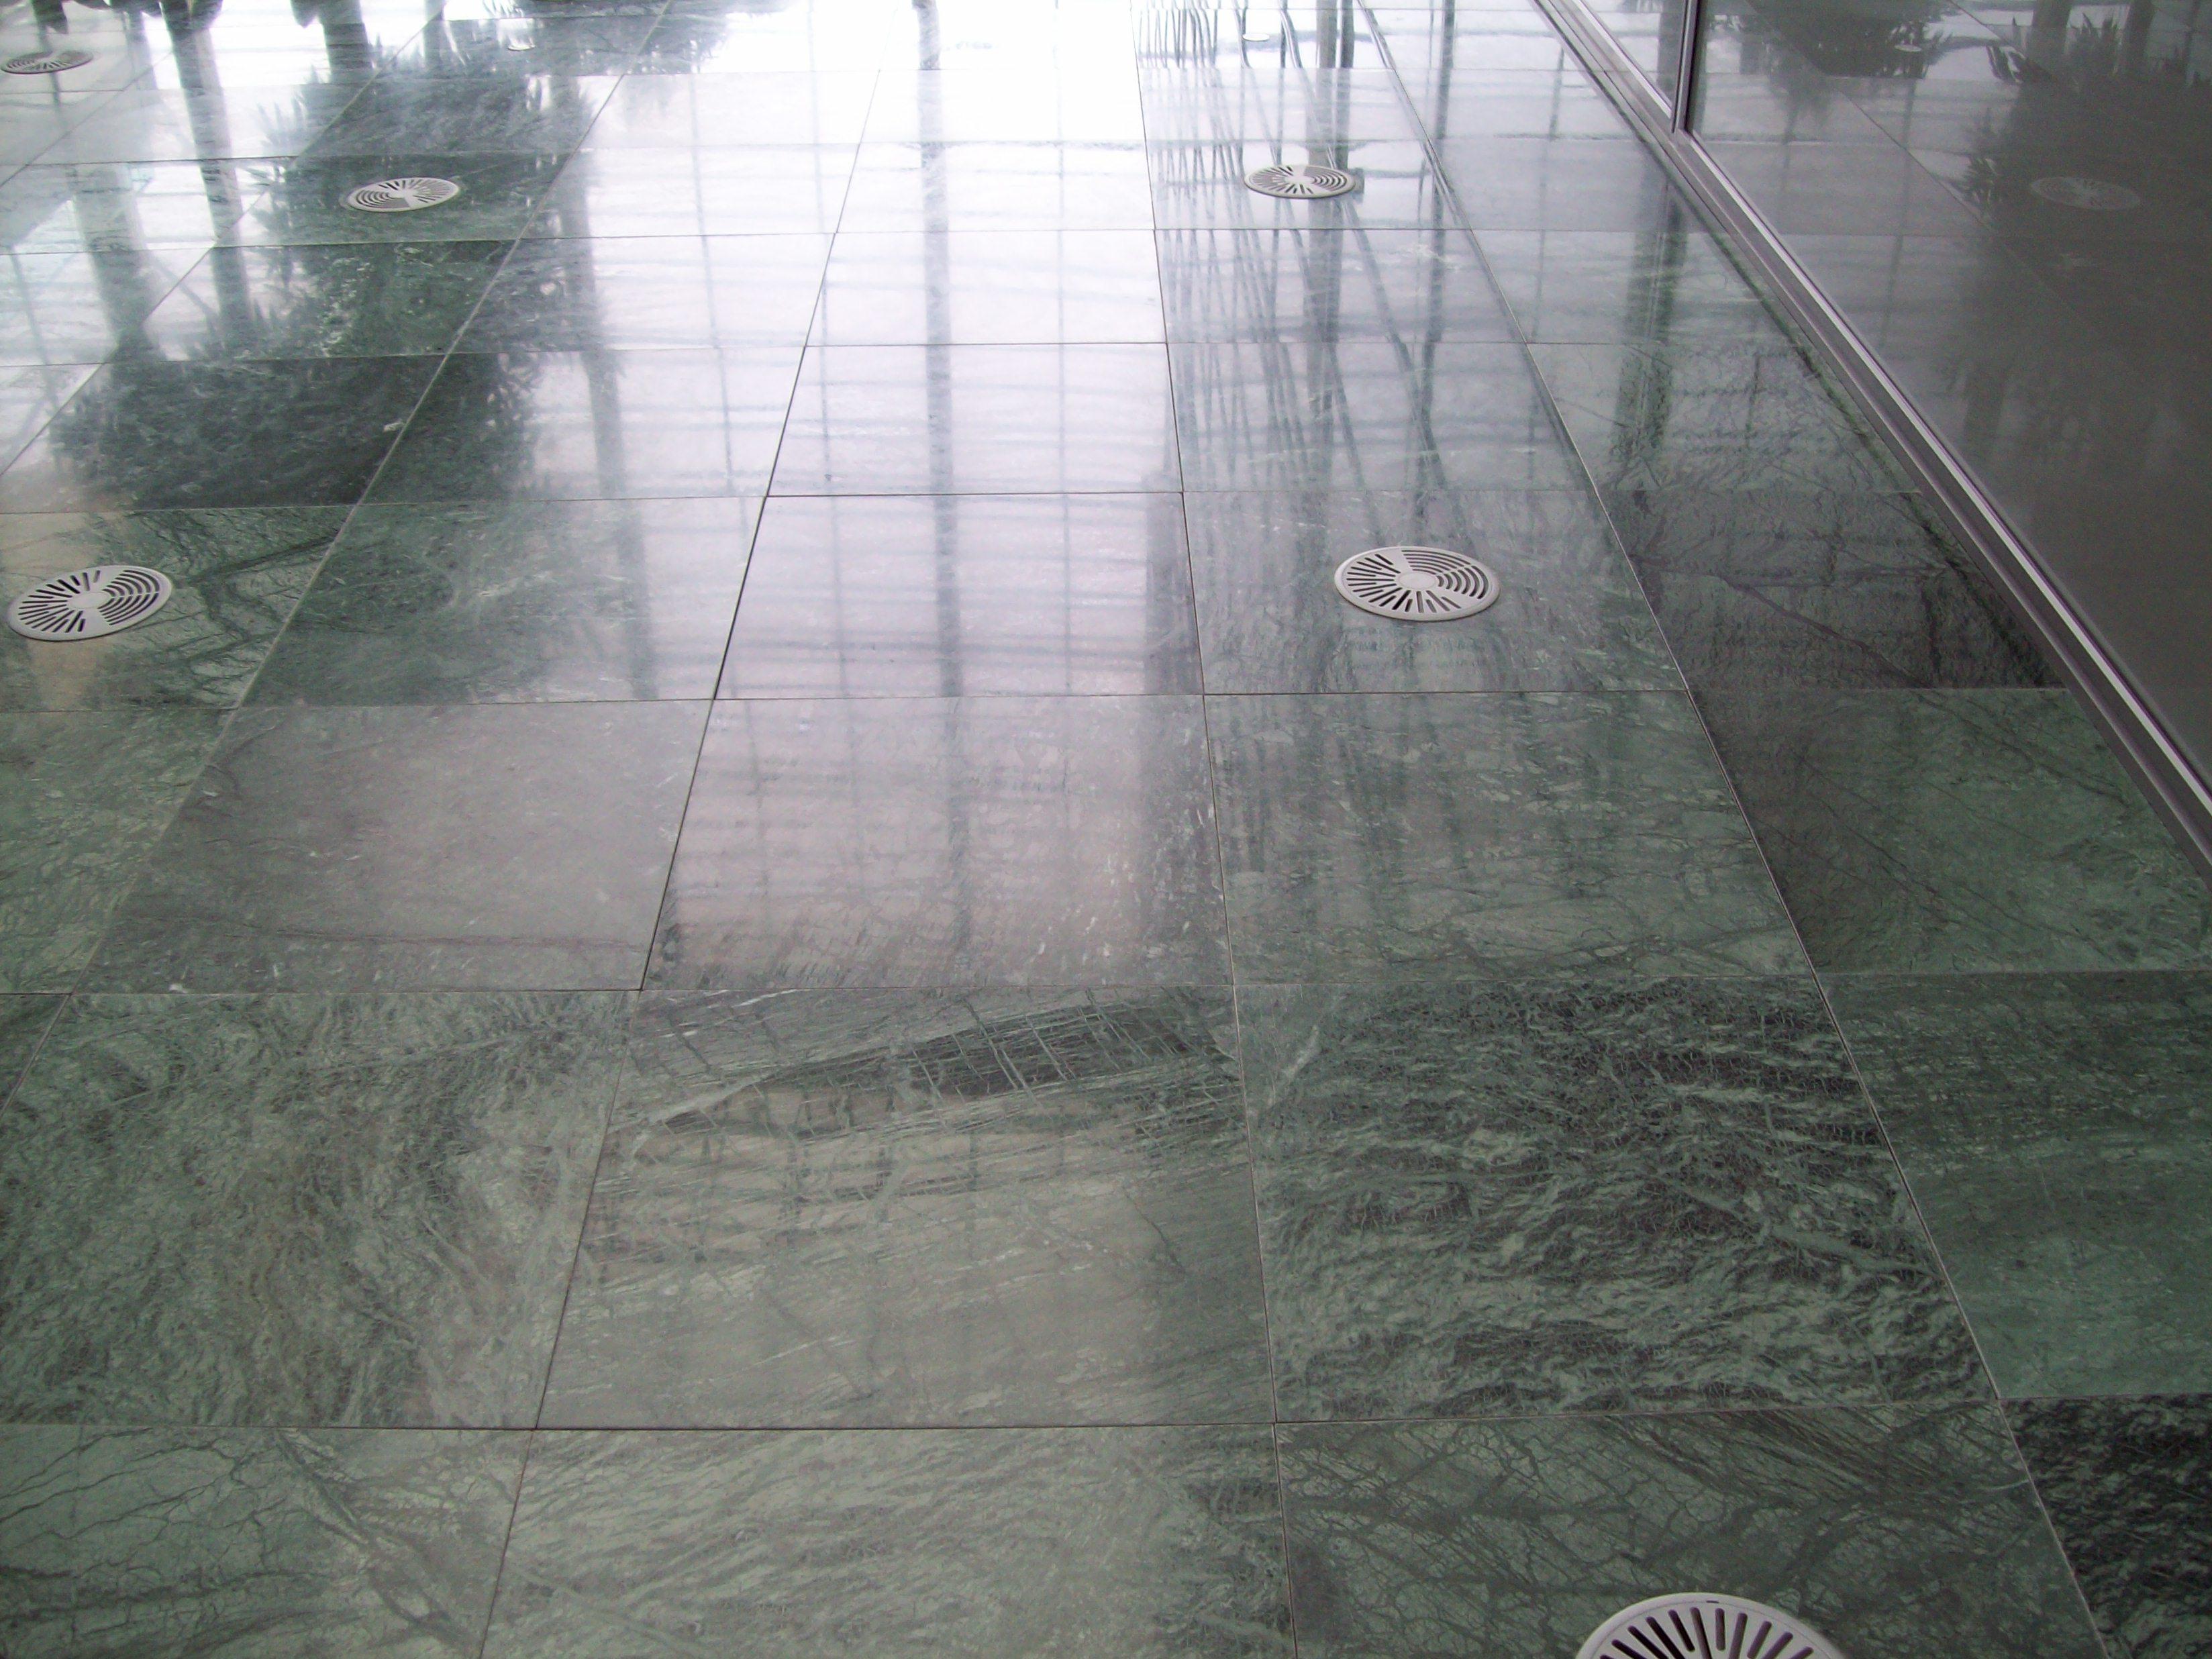 SAB MARMO 003 State Audit Bureau: pavimenti sopraelevati Nesite anche in Kuwait